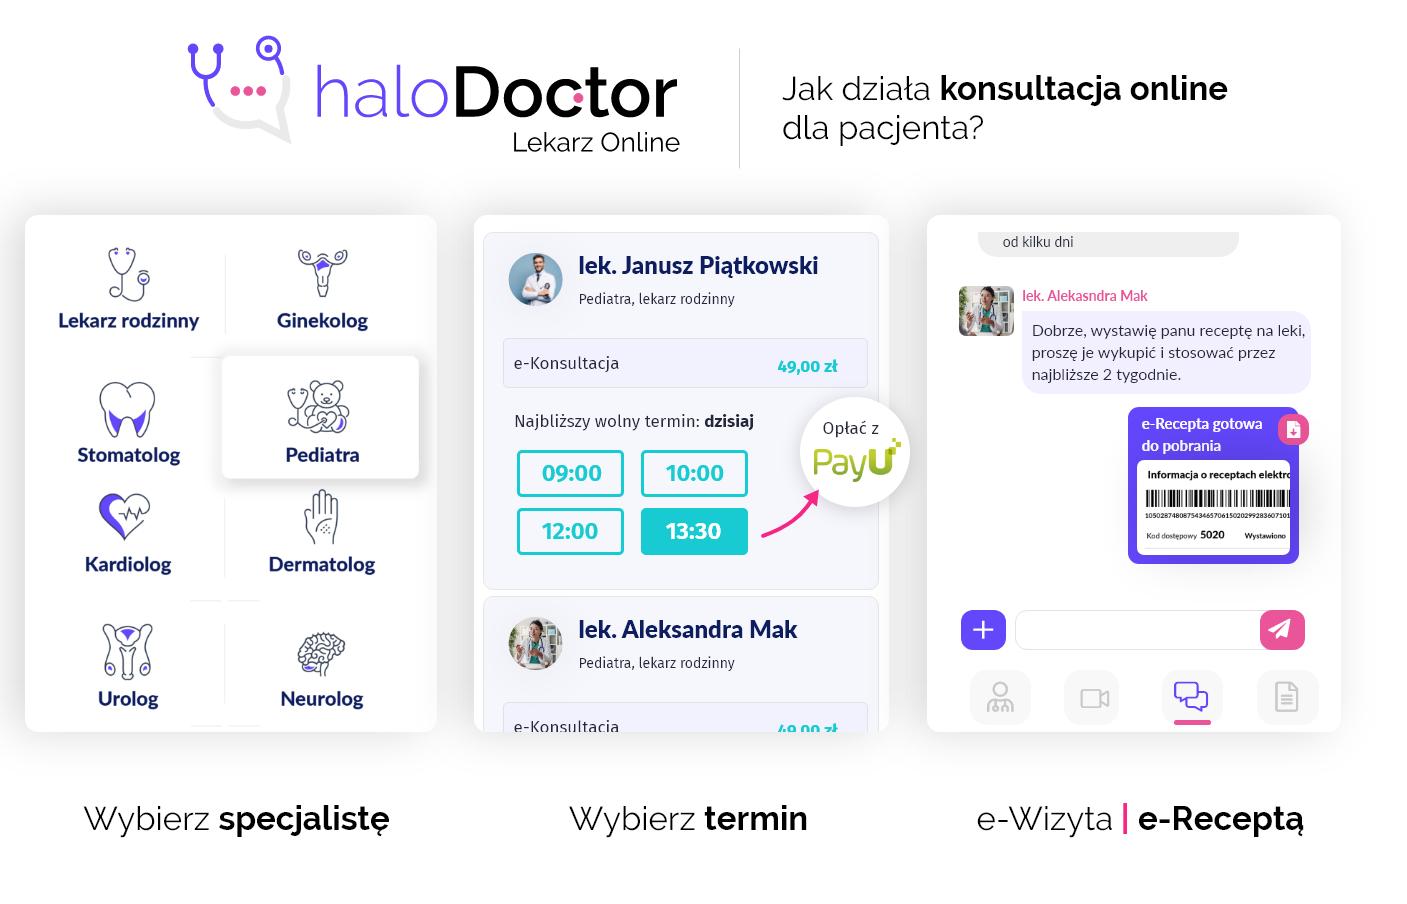 halodoctor.pl - e-wizyty. e-Recepta.